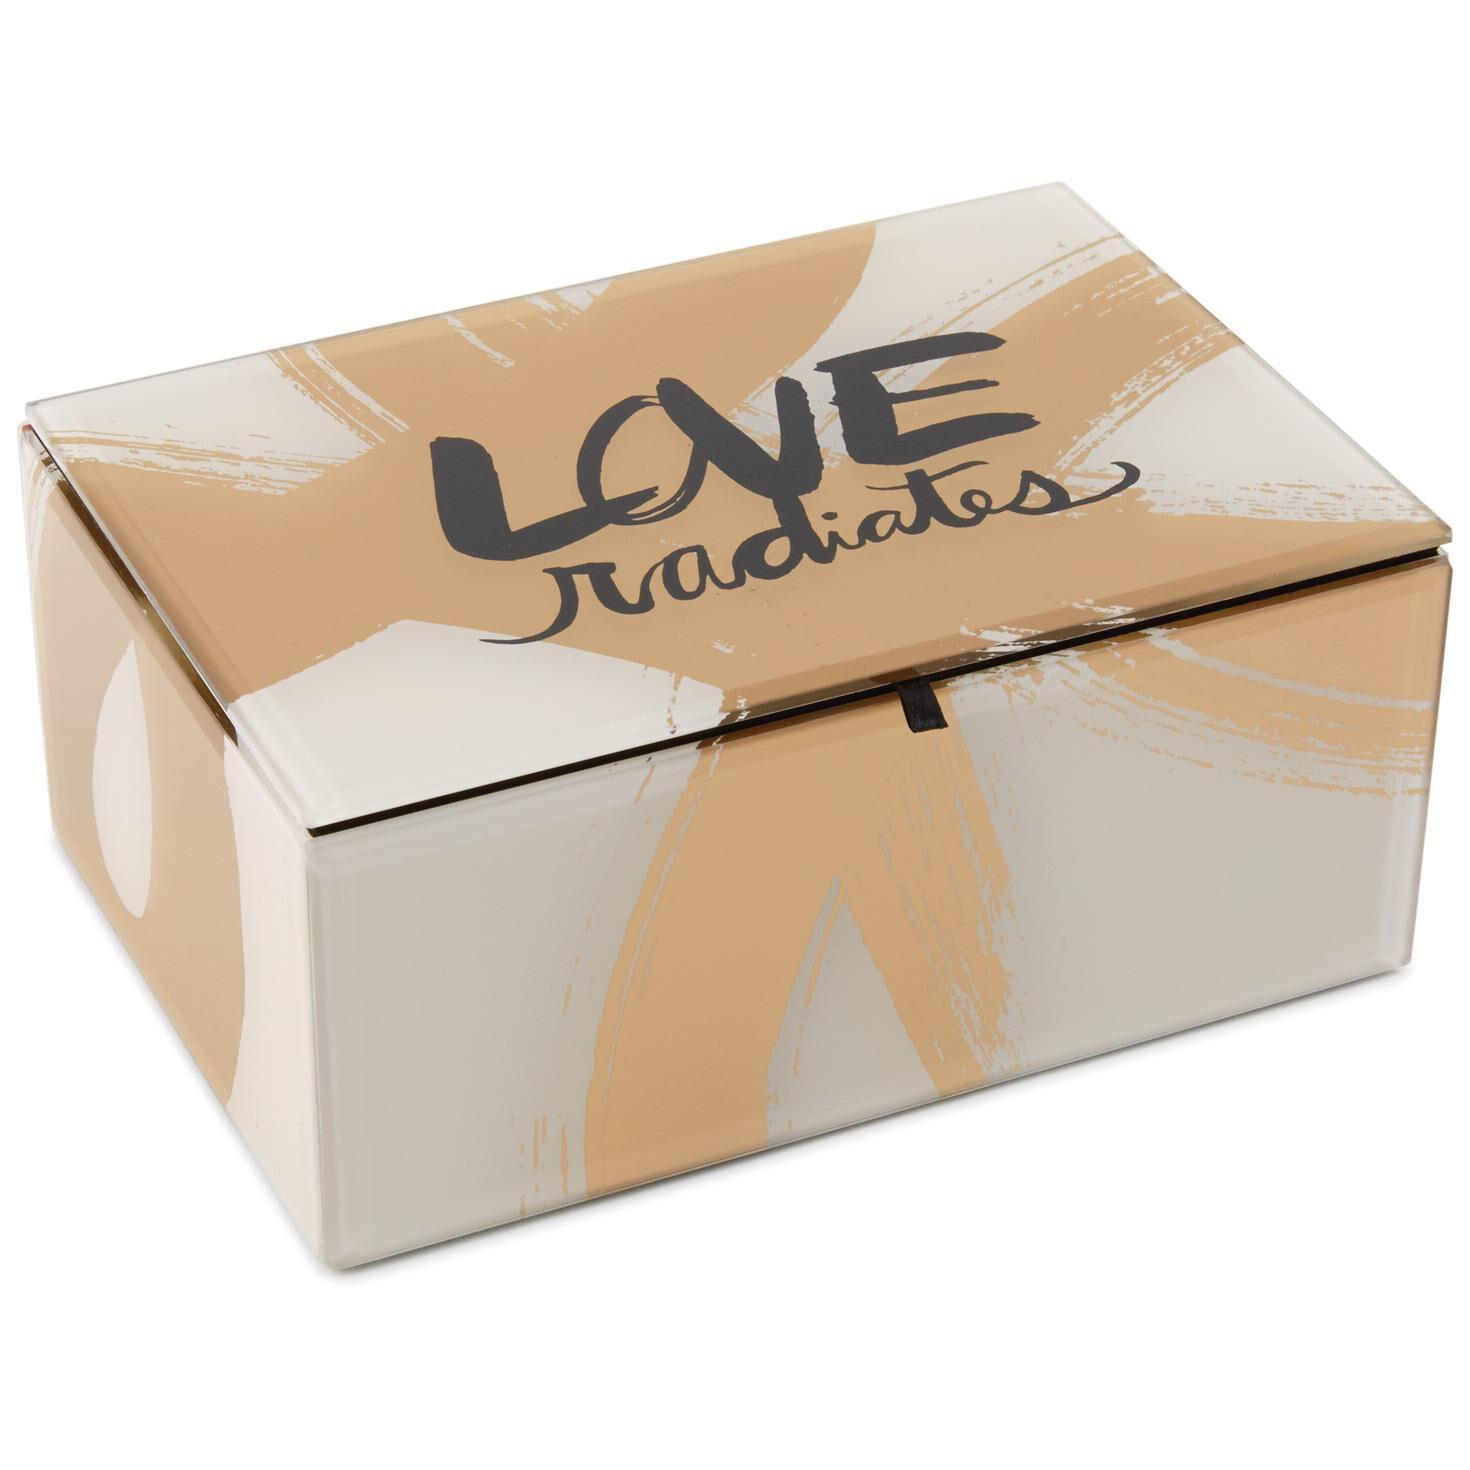 Love Radiates Jewelry Box Decorative Accessories Hallmark